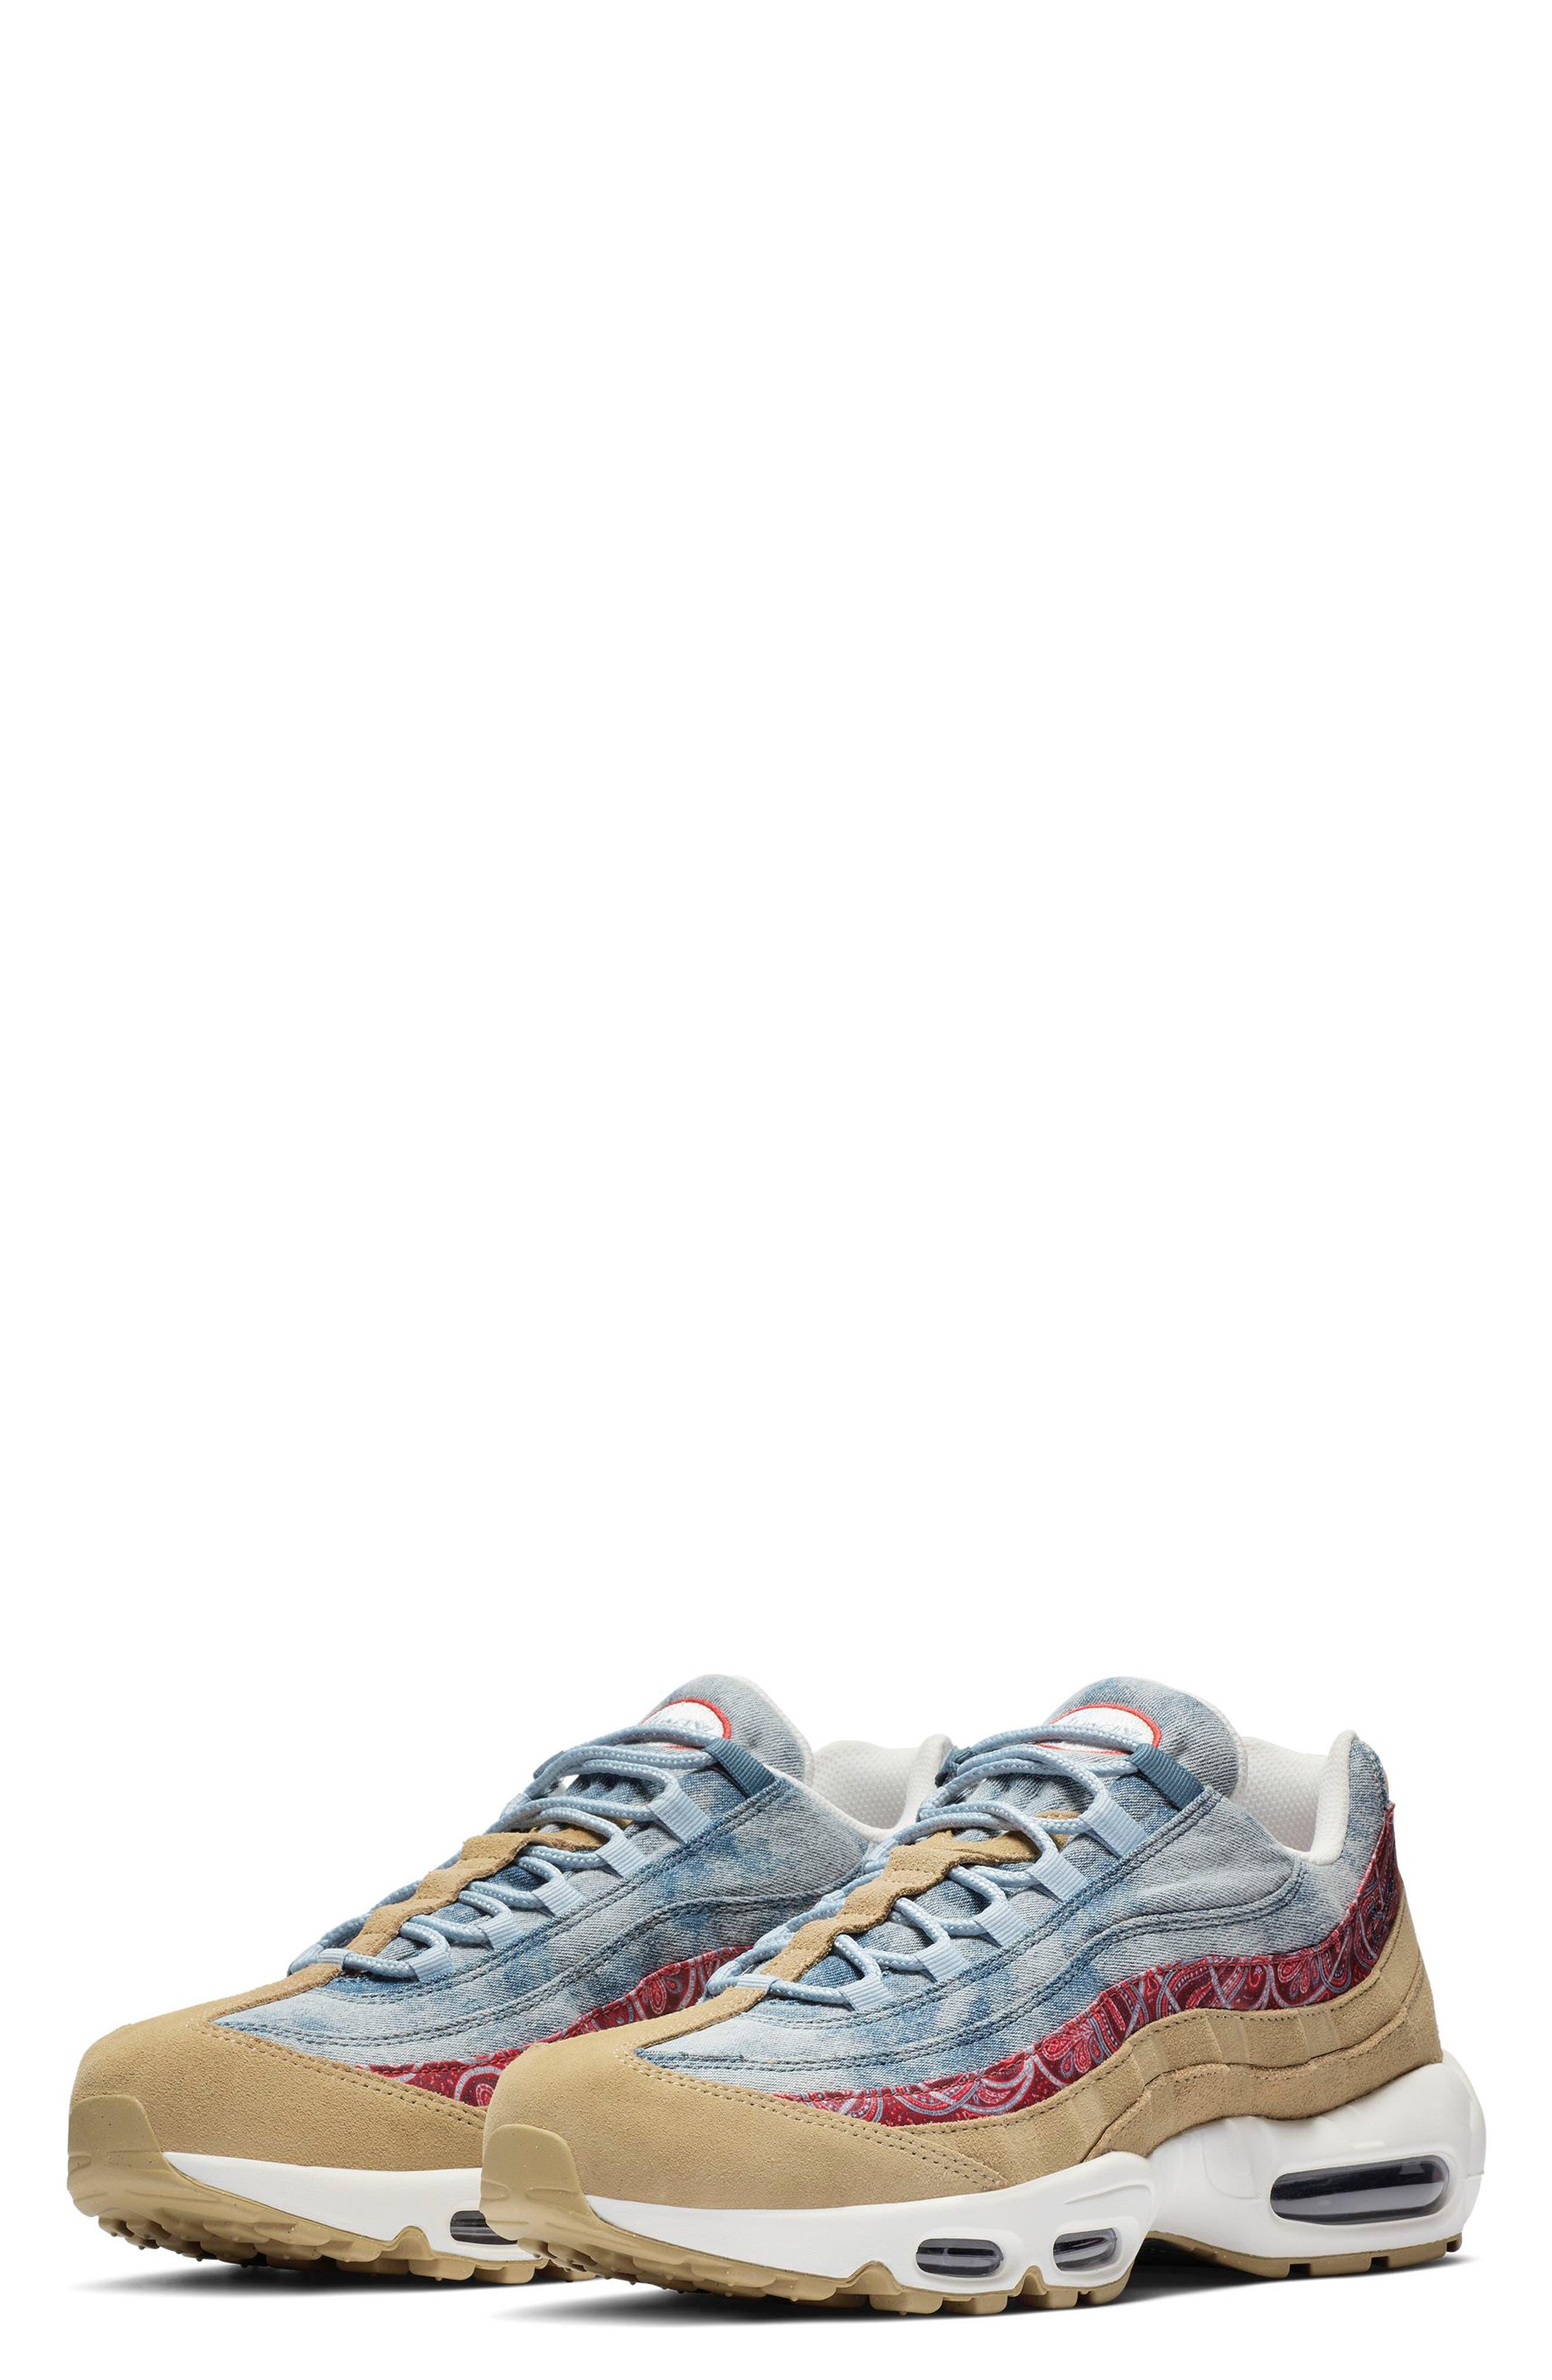 Air Max 95 Sneaker, Main, color, PARACHUTE BEIGE/ RED